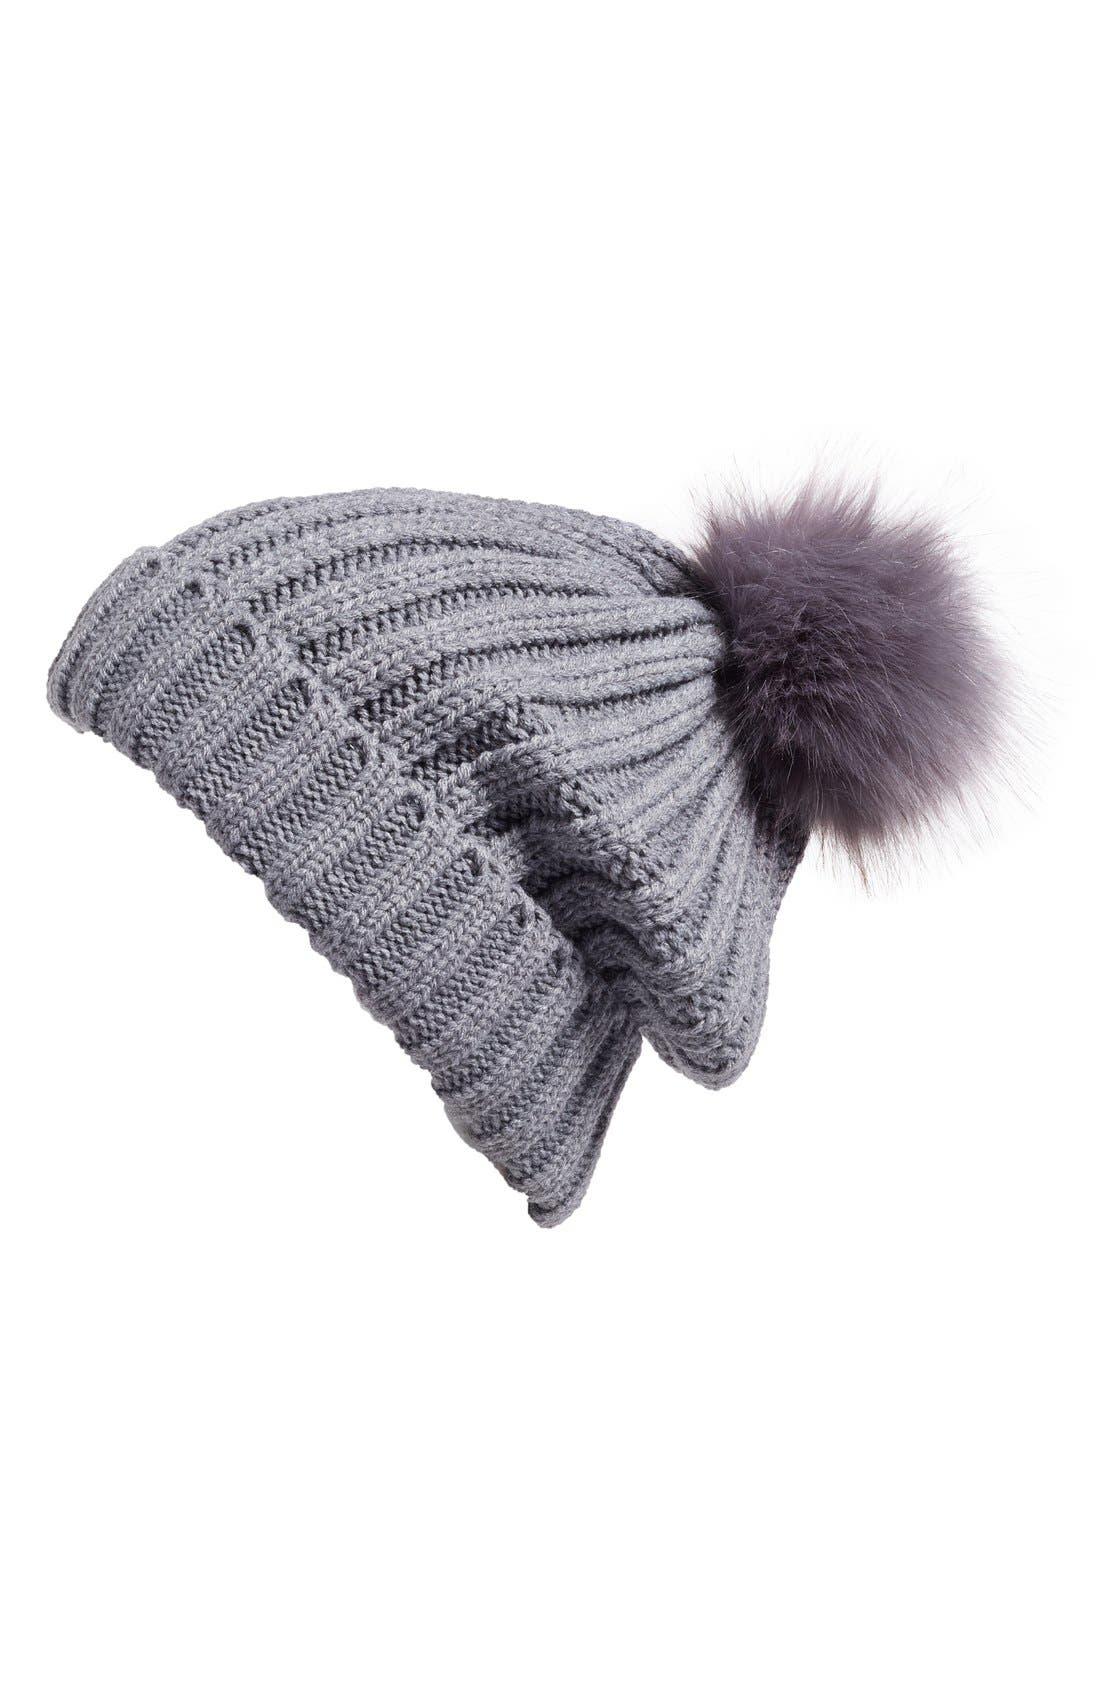 Alternate Image 1 Selected - BP. Faux Fur Pom Rib Knit Beanie